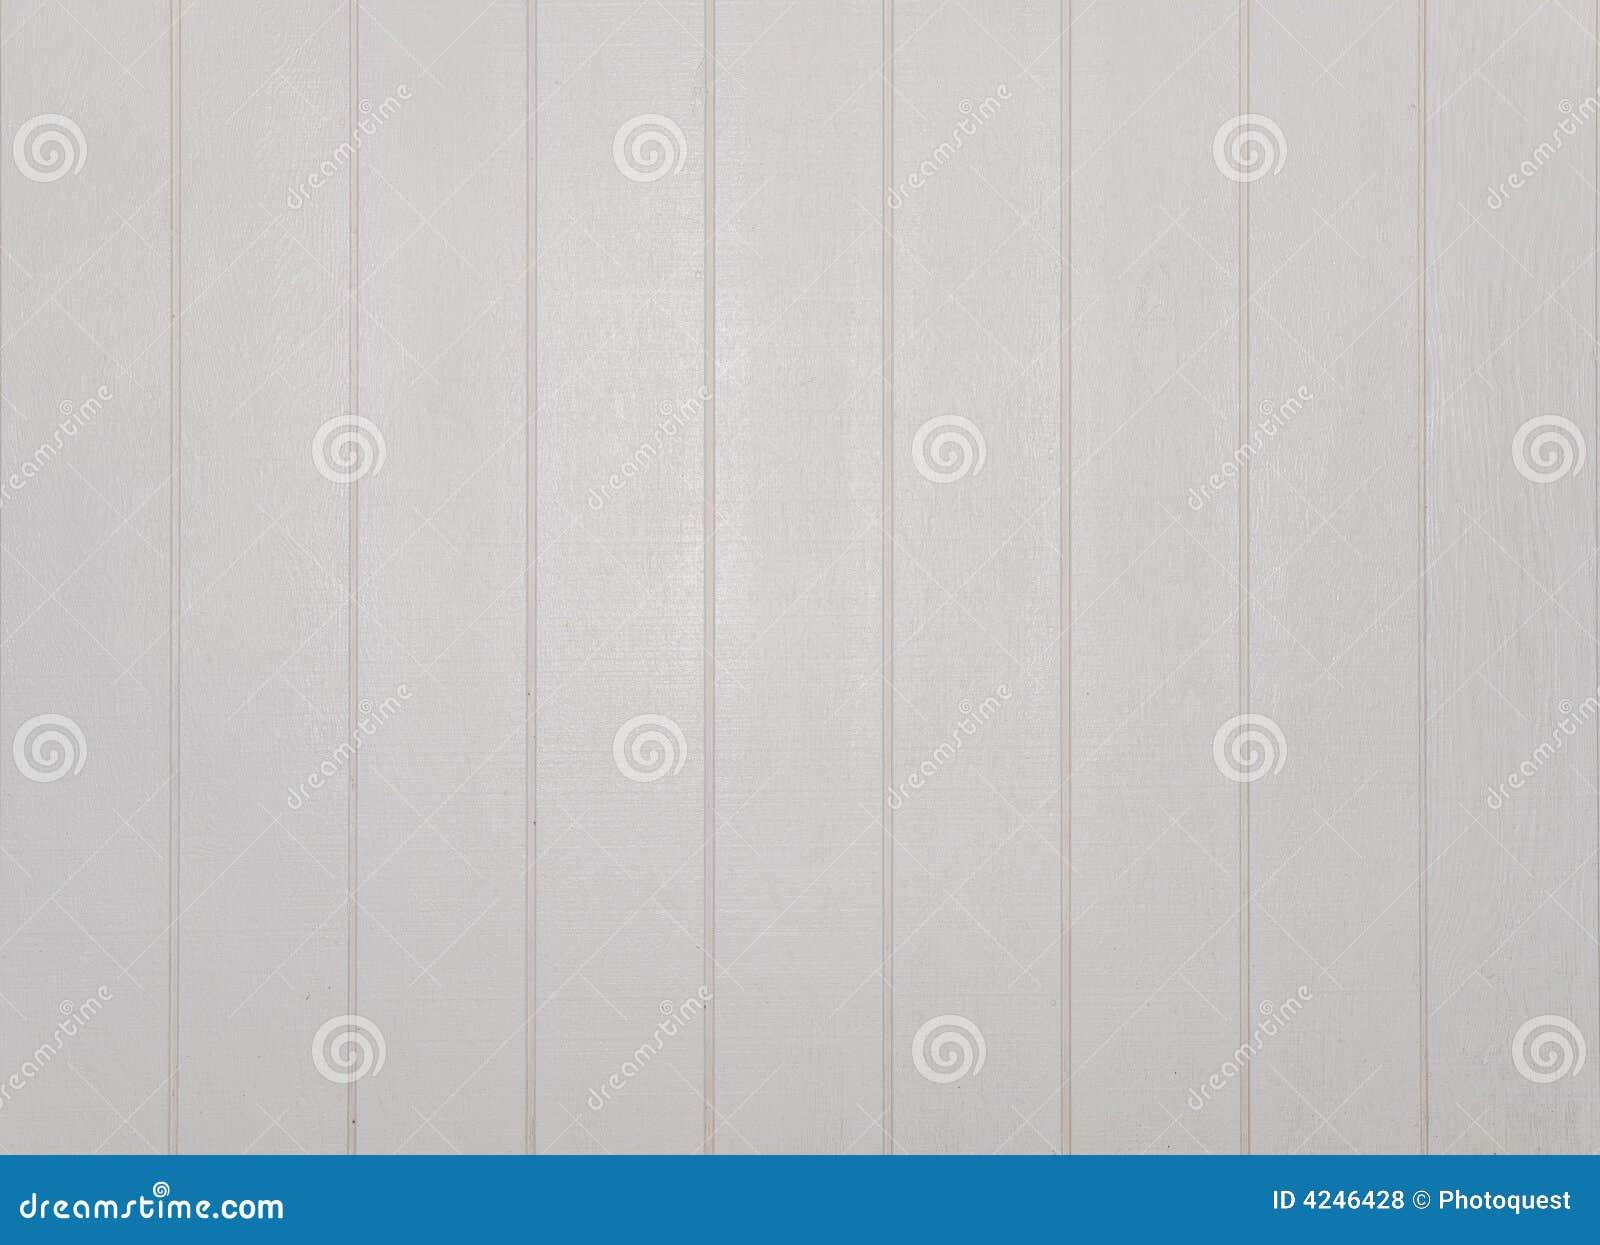 Fondo blanco de la cerca, textura